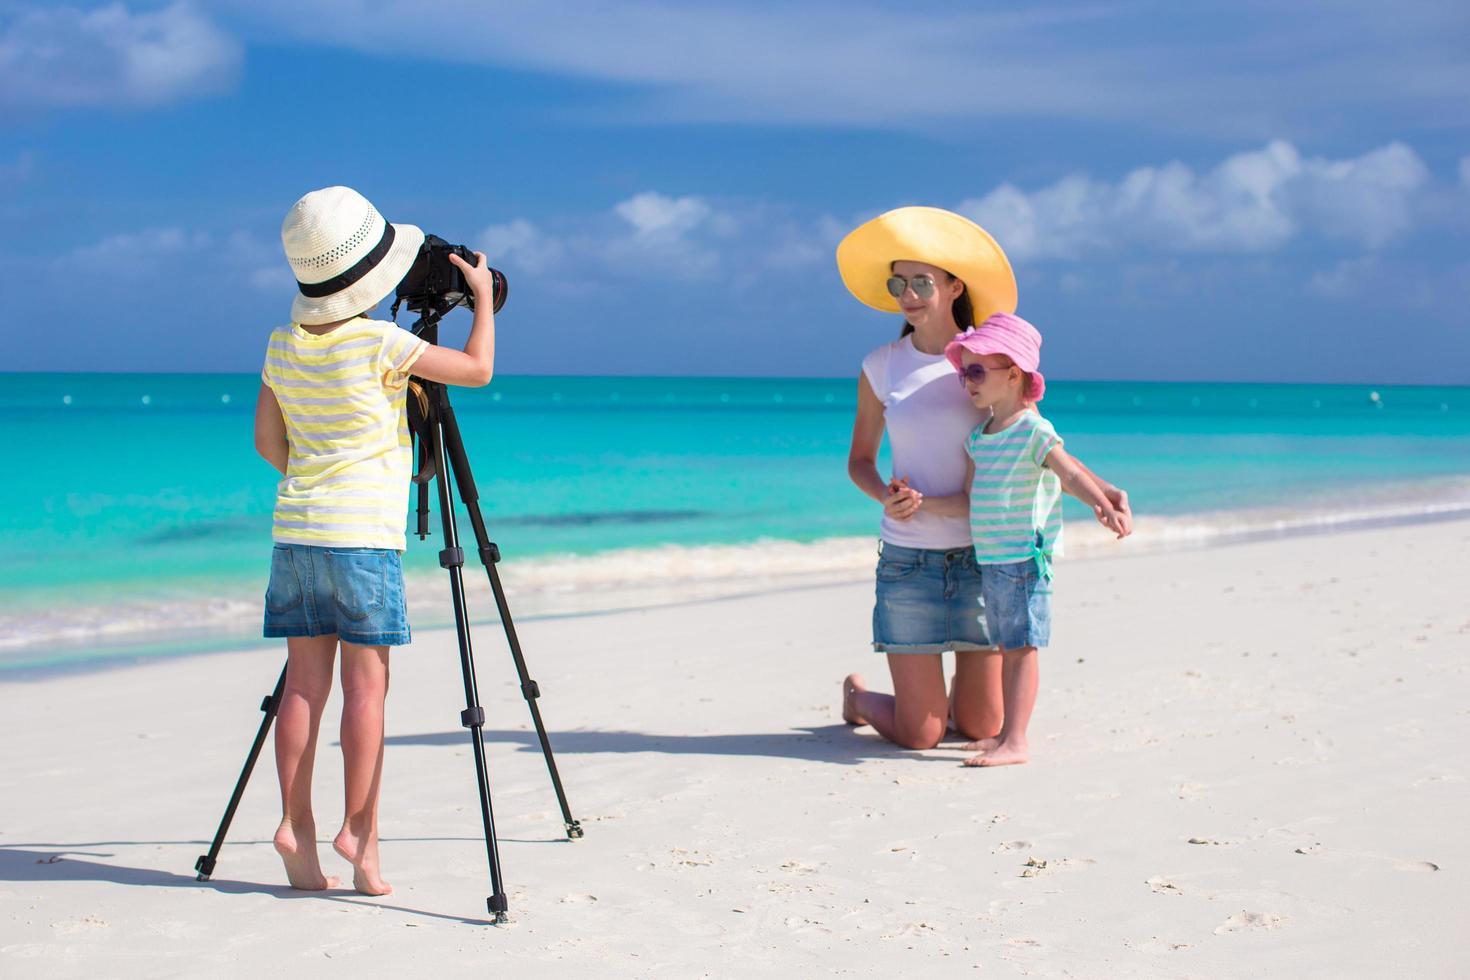 familie die vakantiefoto's op een strand neemt foto